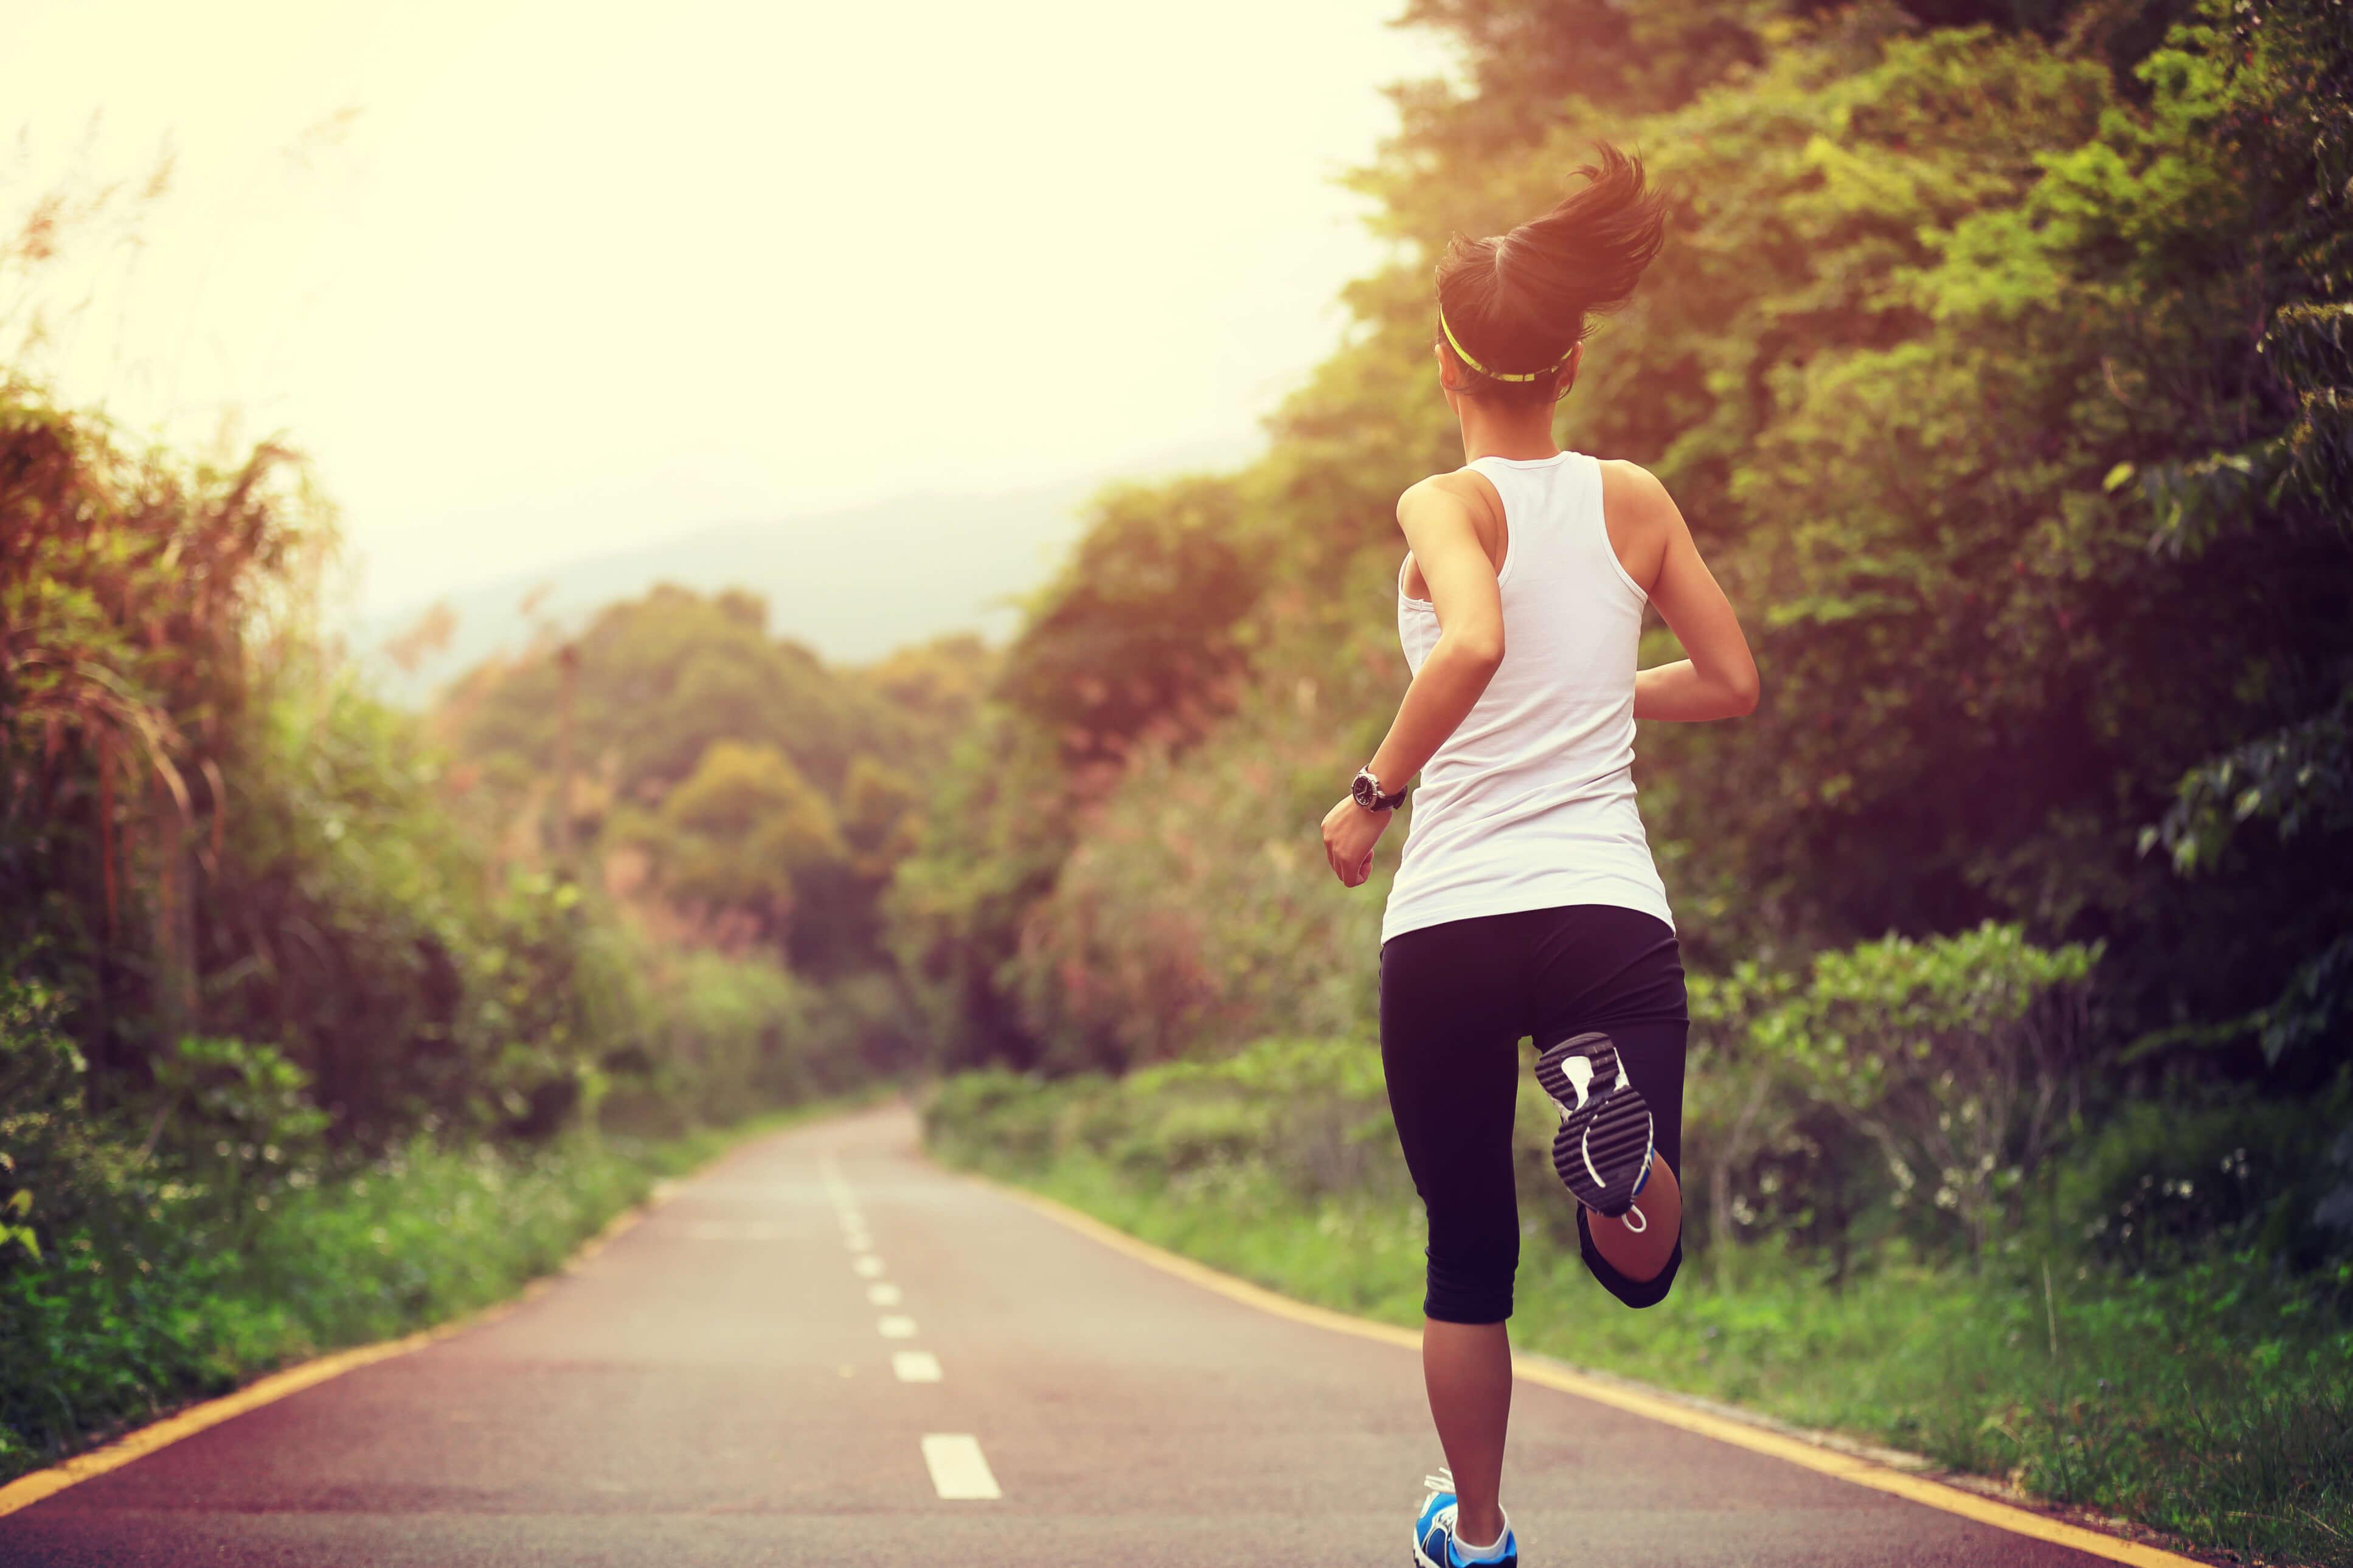 Фото человек бежит по жизни